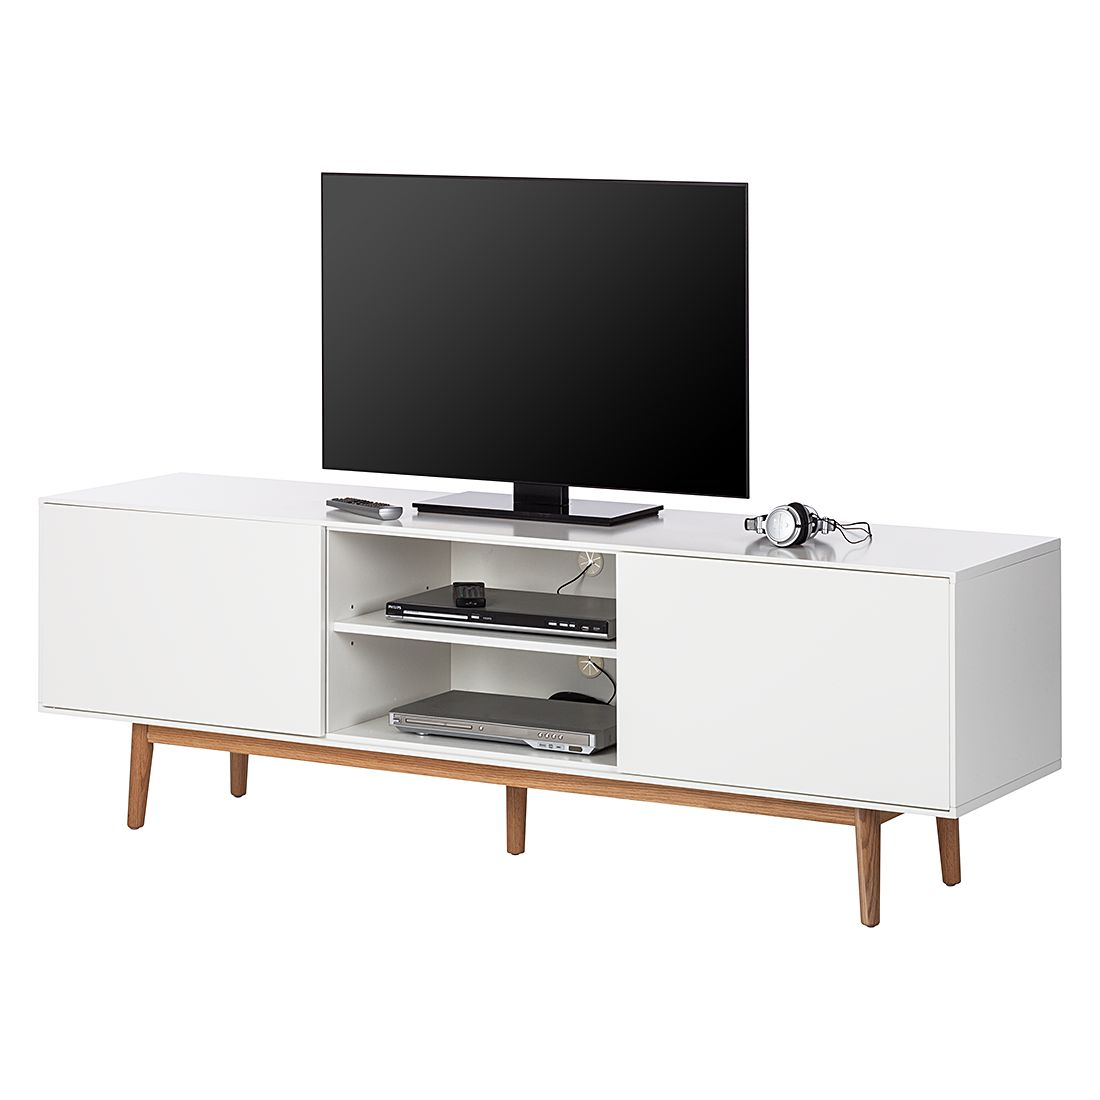 Meuble TV Lindholm - Blanc / Chêne massif, Morteens